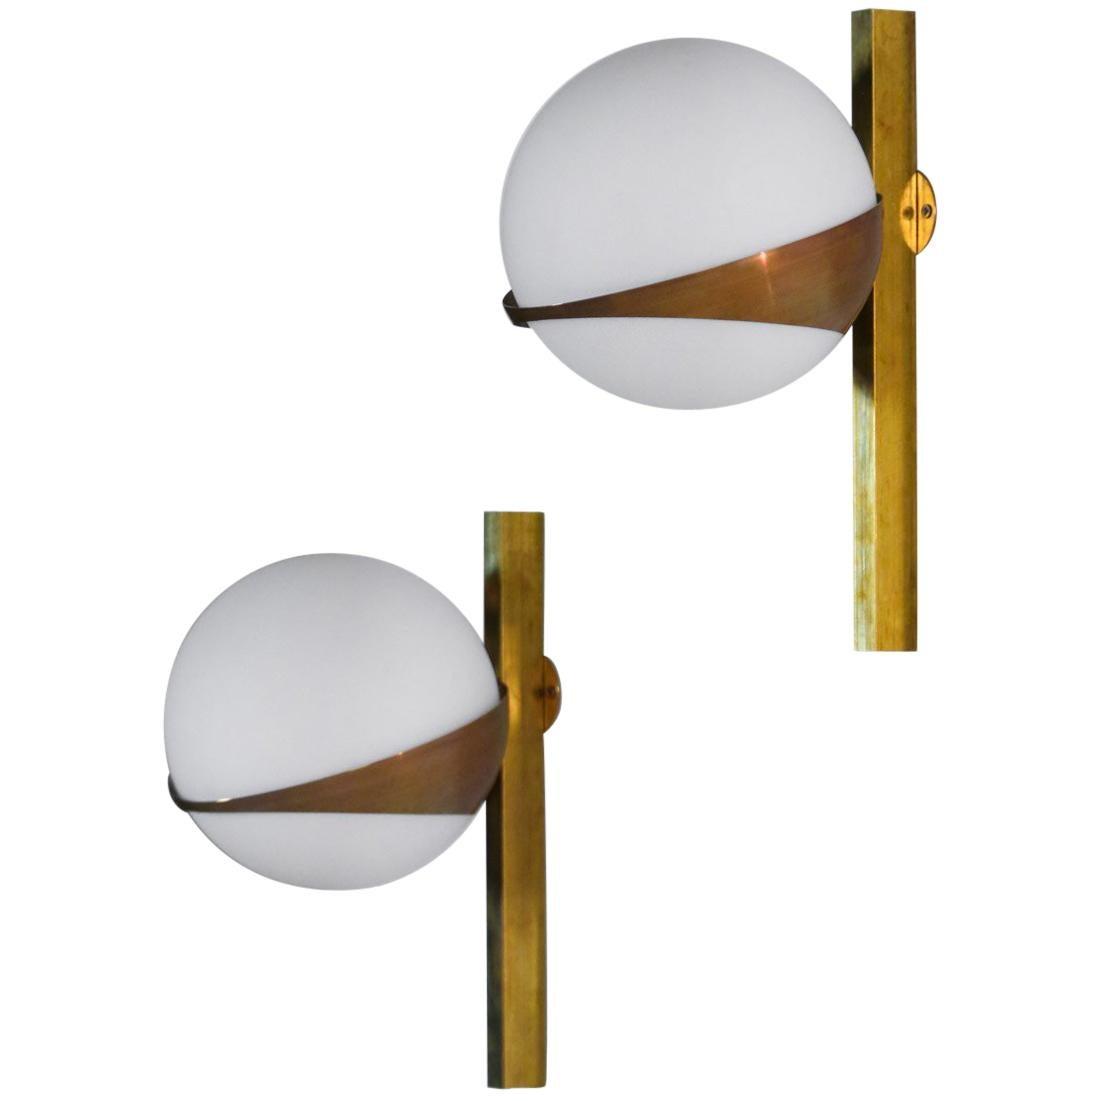 Italian Sconces, Stilnovo Style Design Midcentury, Opaline and Brass